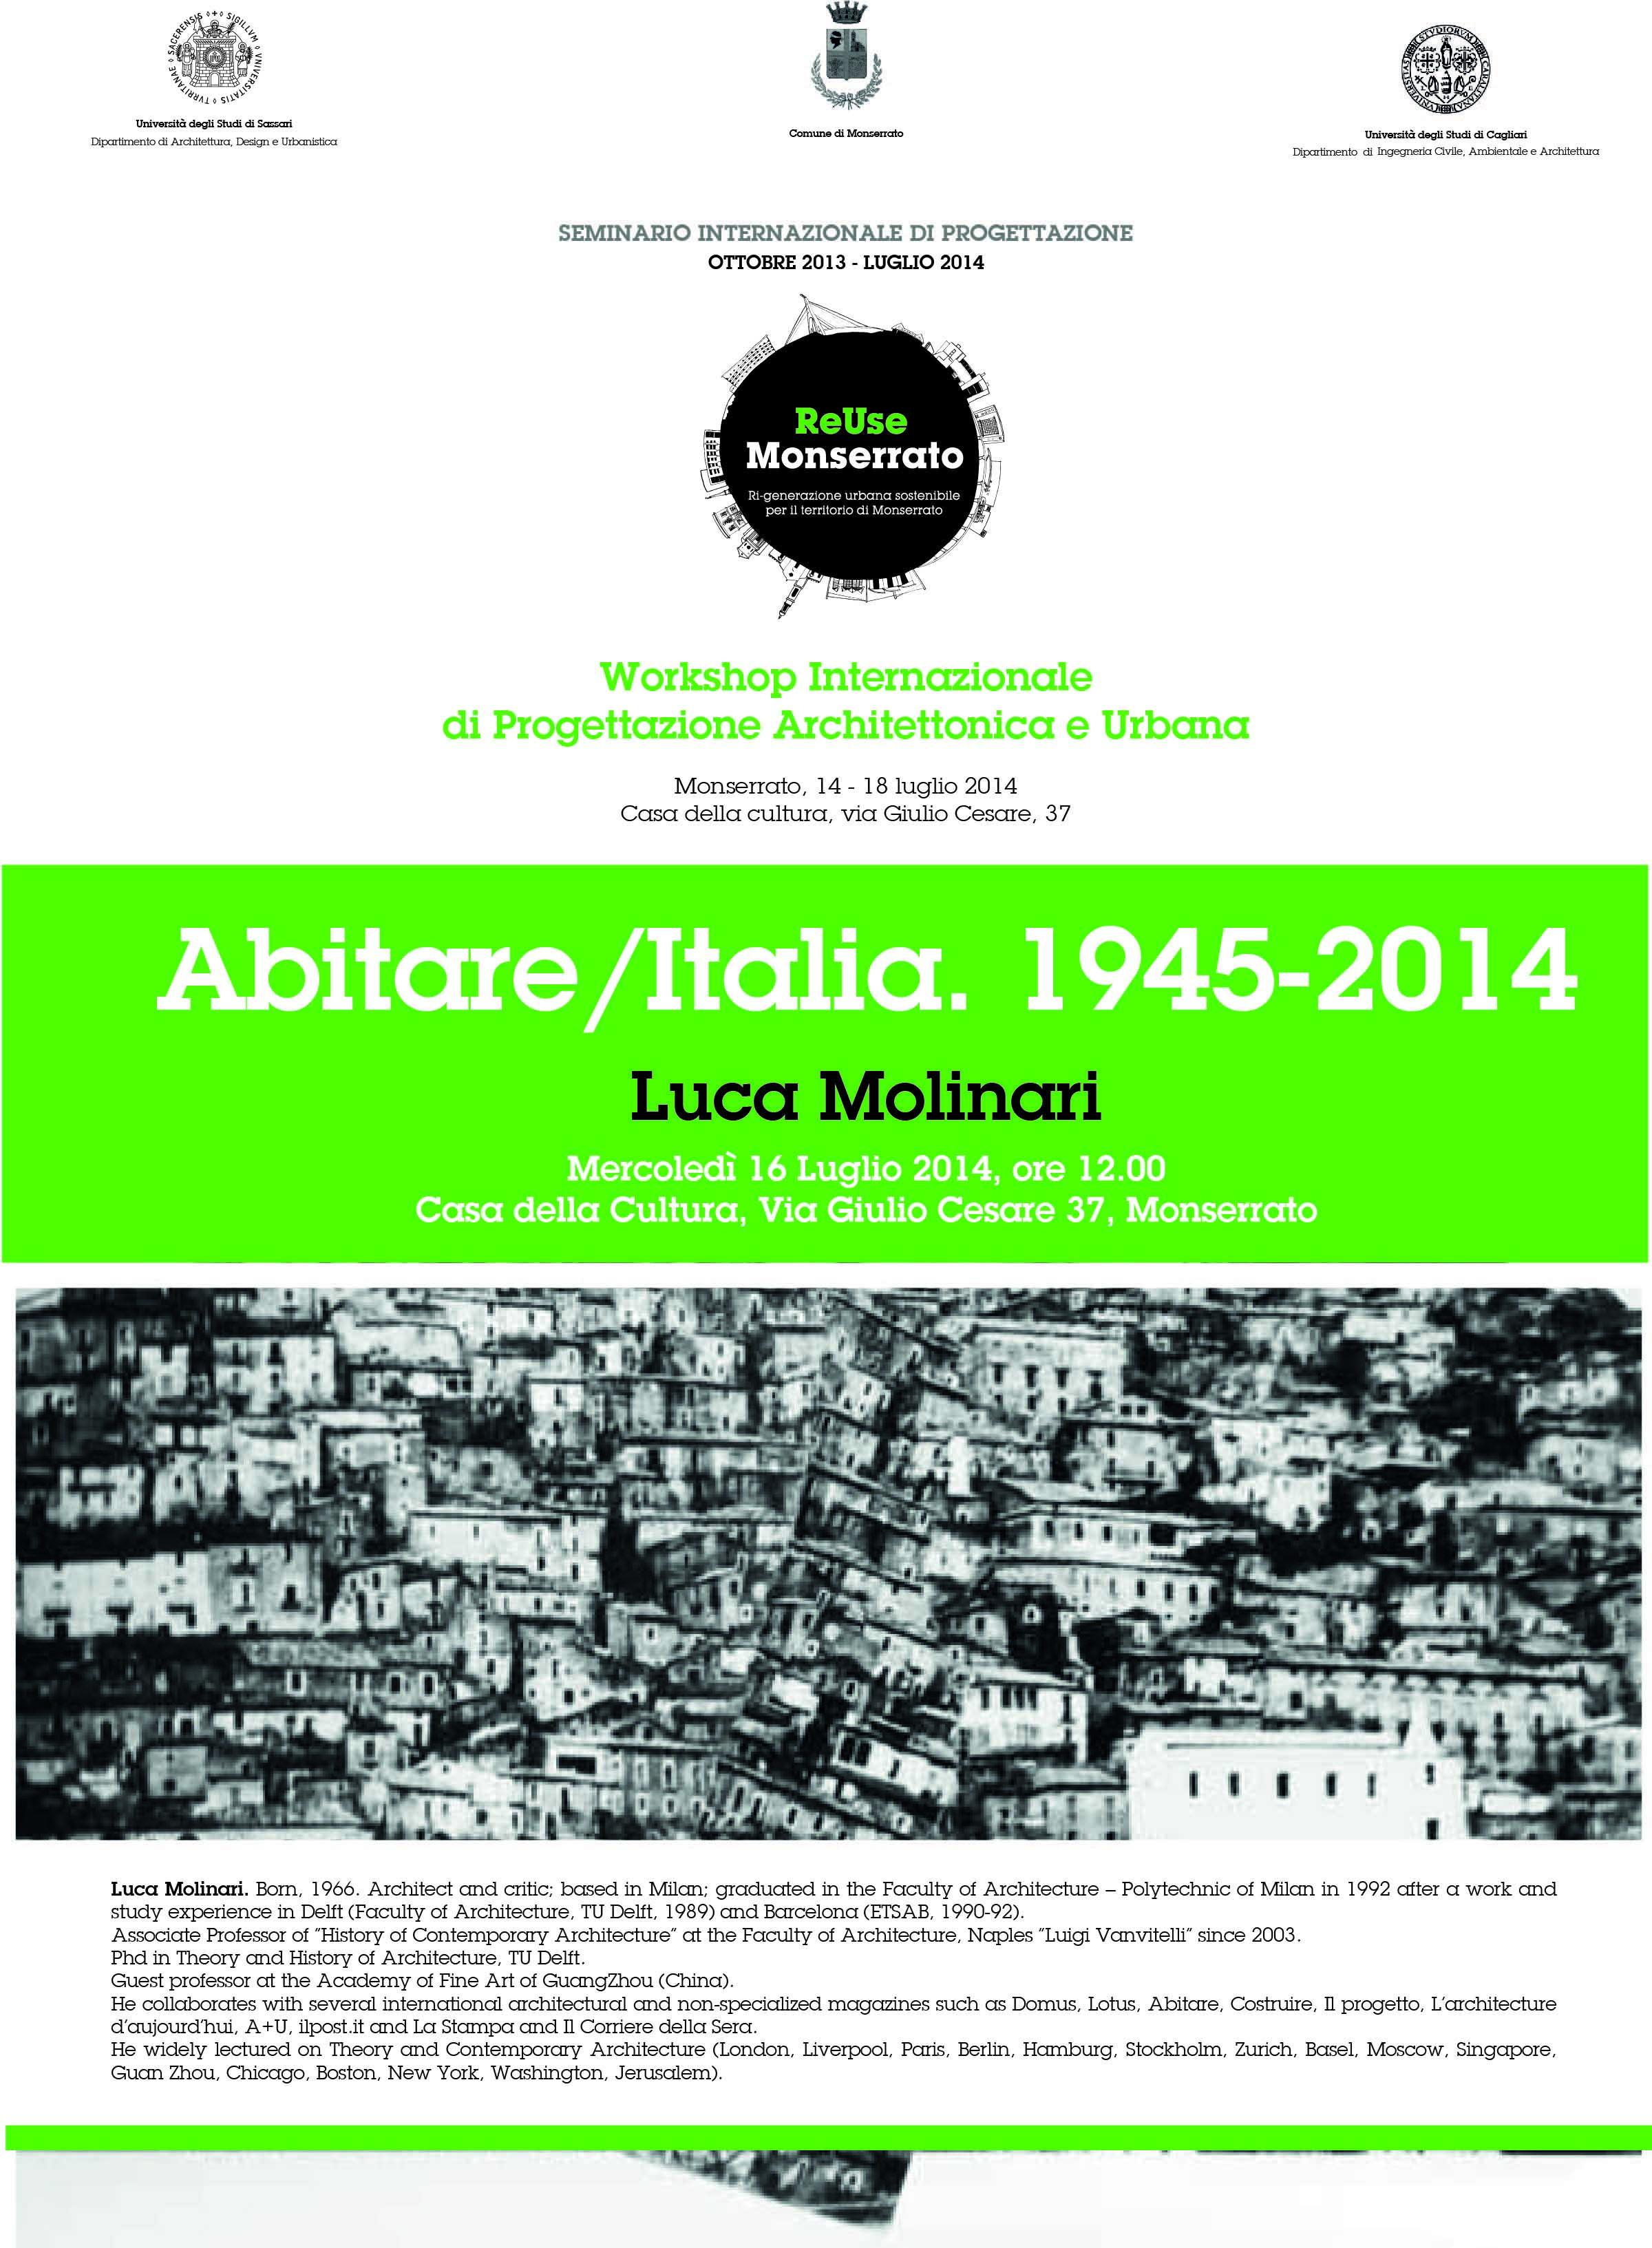 Abitare/Italia. 1945-2014